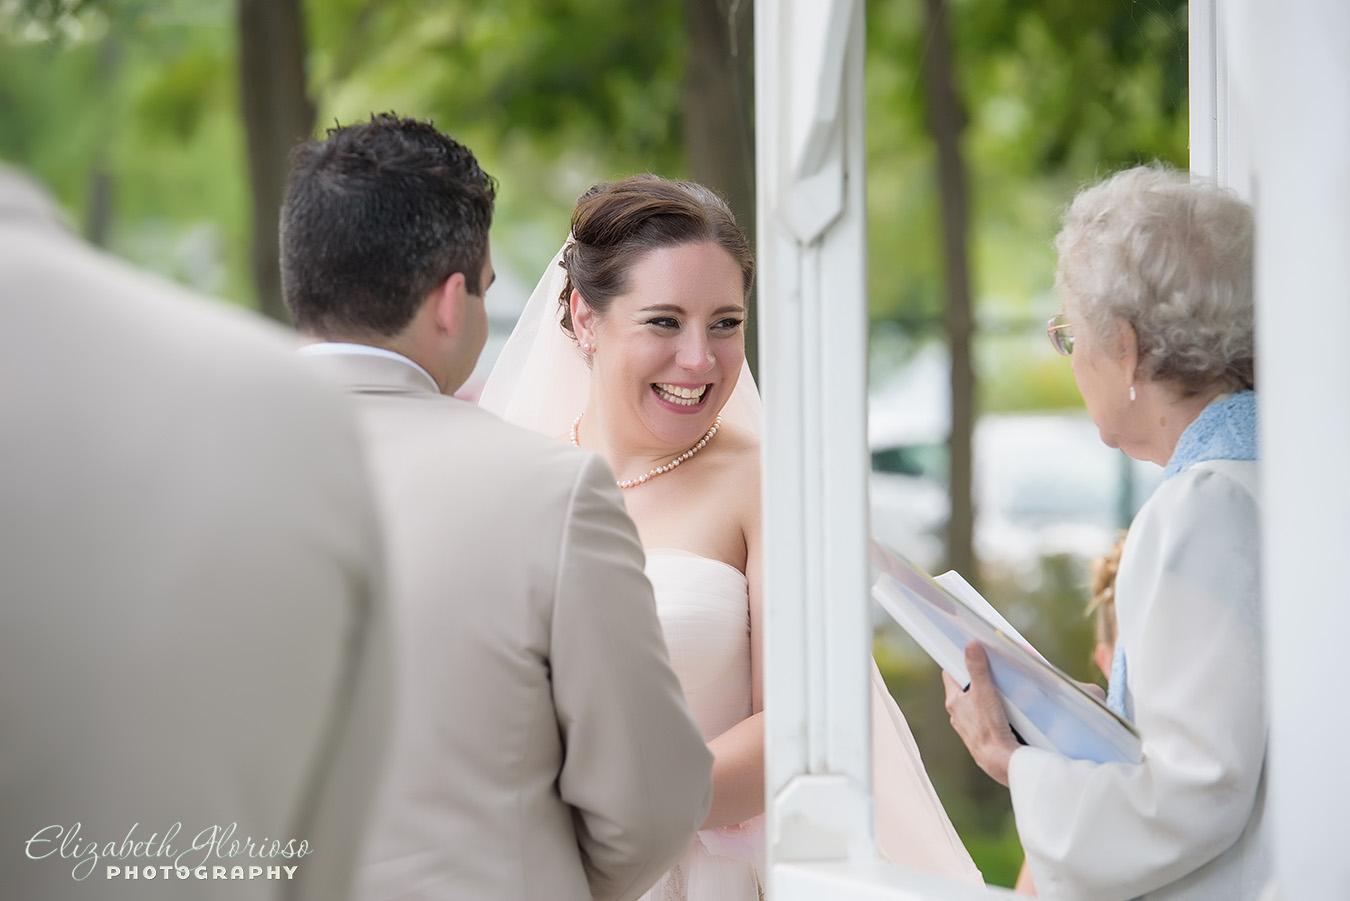 Vermilion_wedding_Glorioso Photography_1028